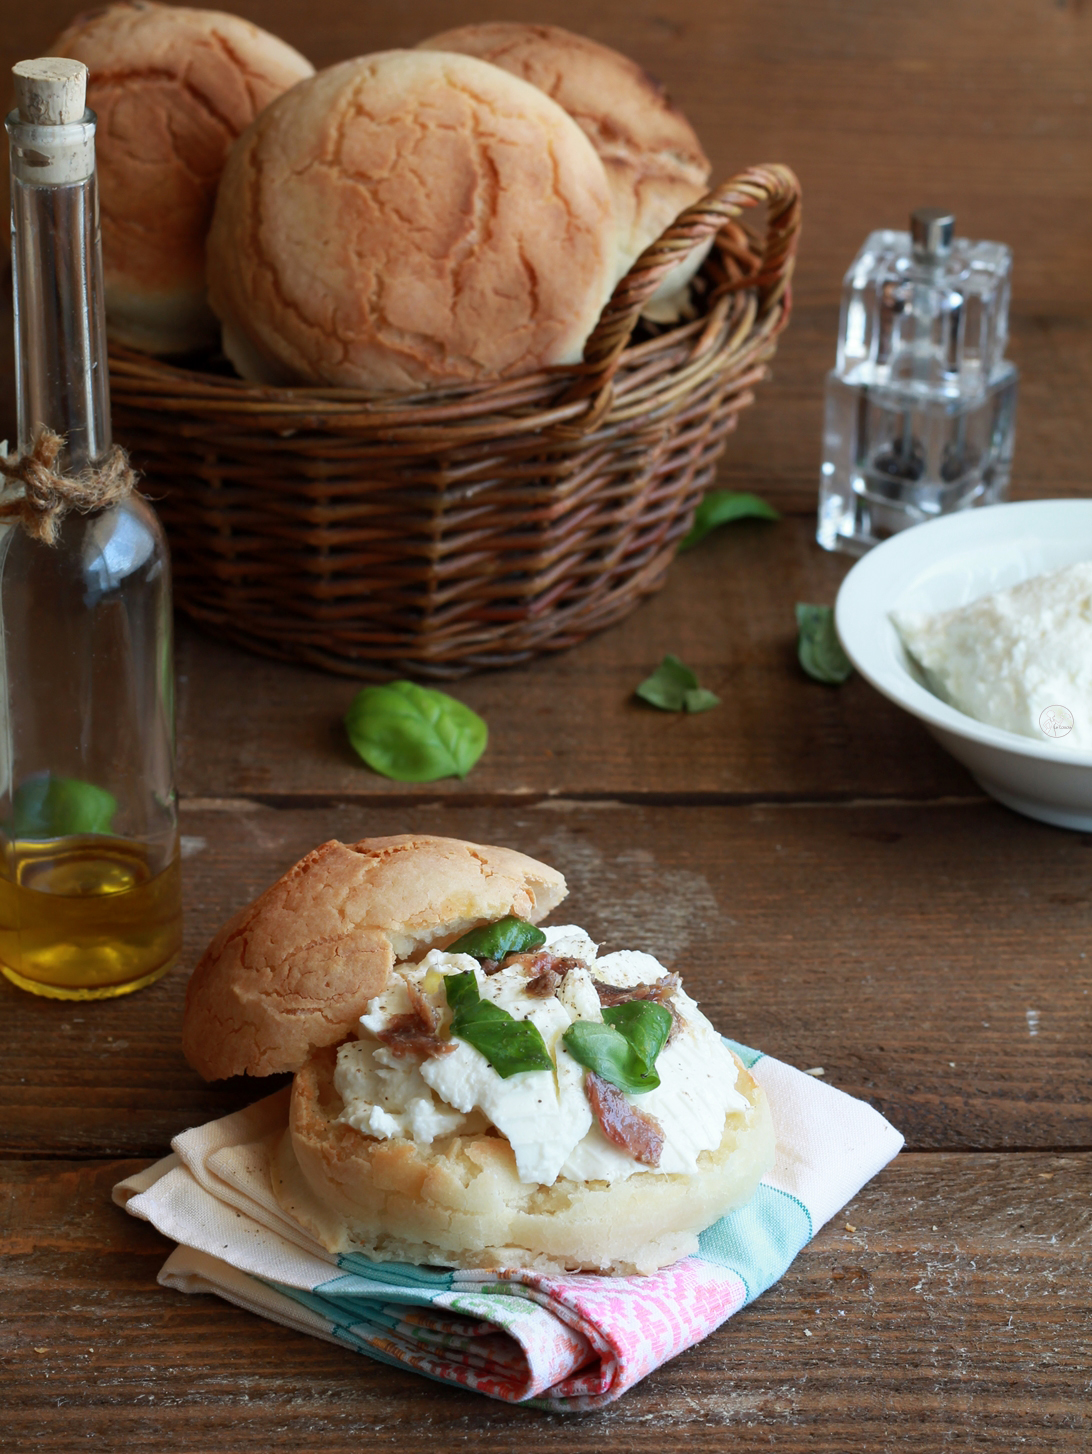 Panini al latte senza glutine - La Cassata Celiaca